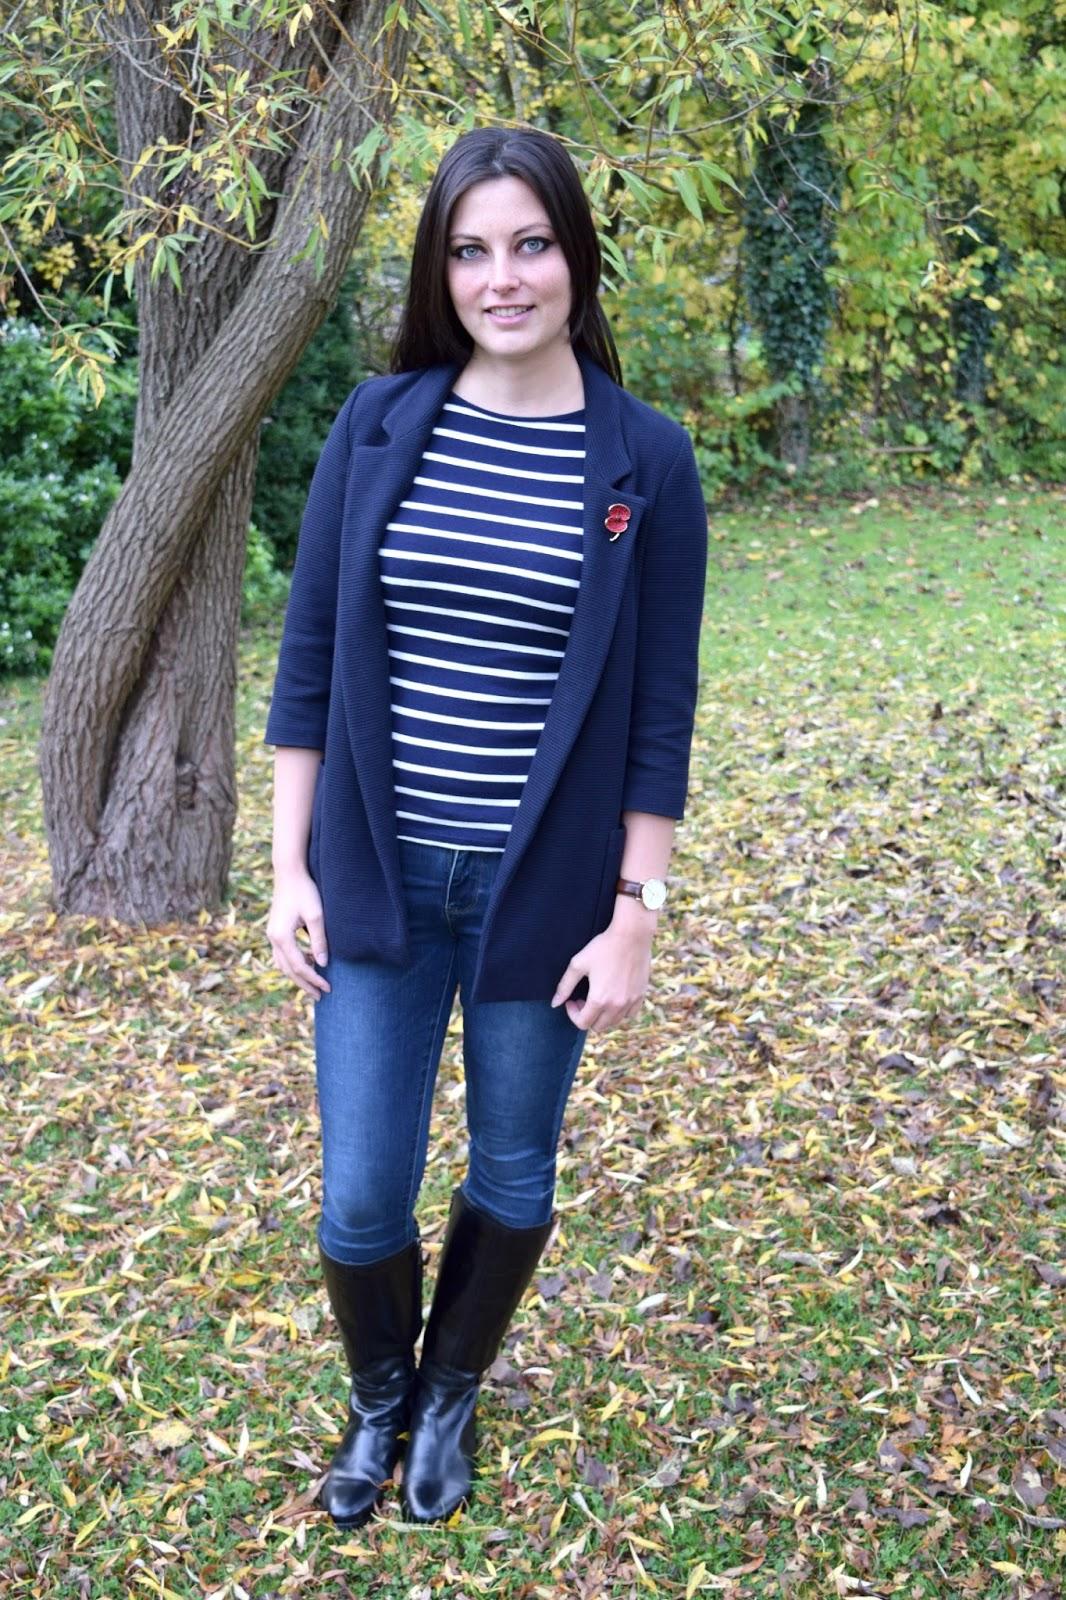 Breton Shirt Duchess of Cambridge look ootd